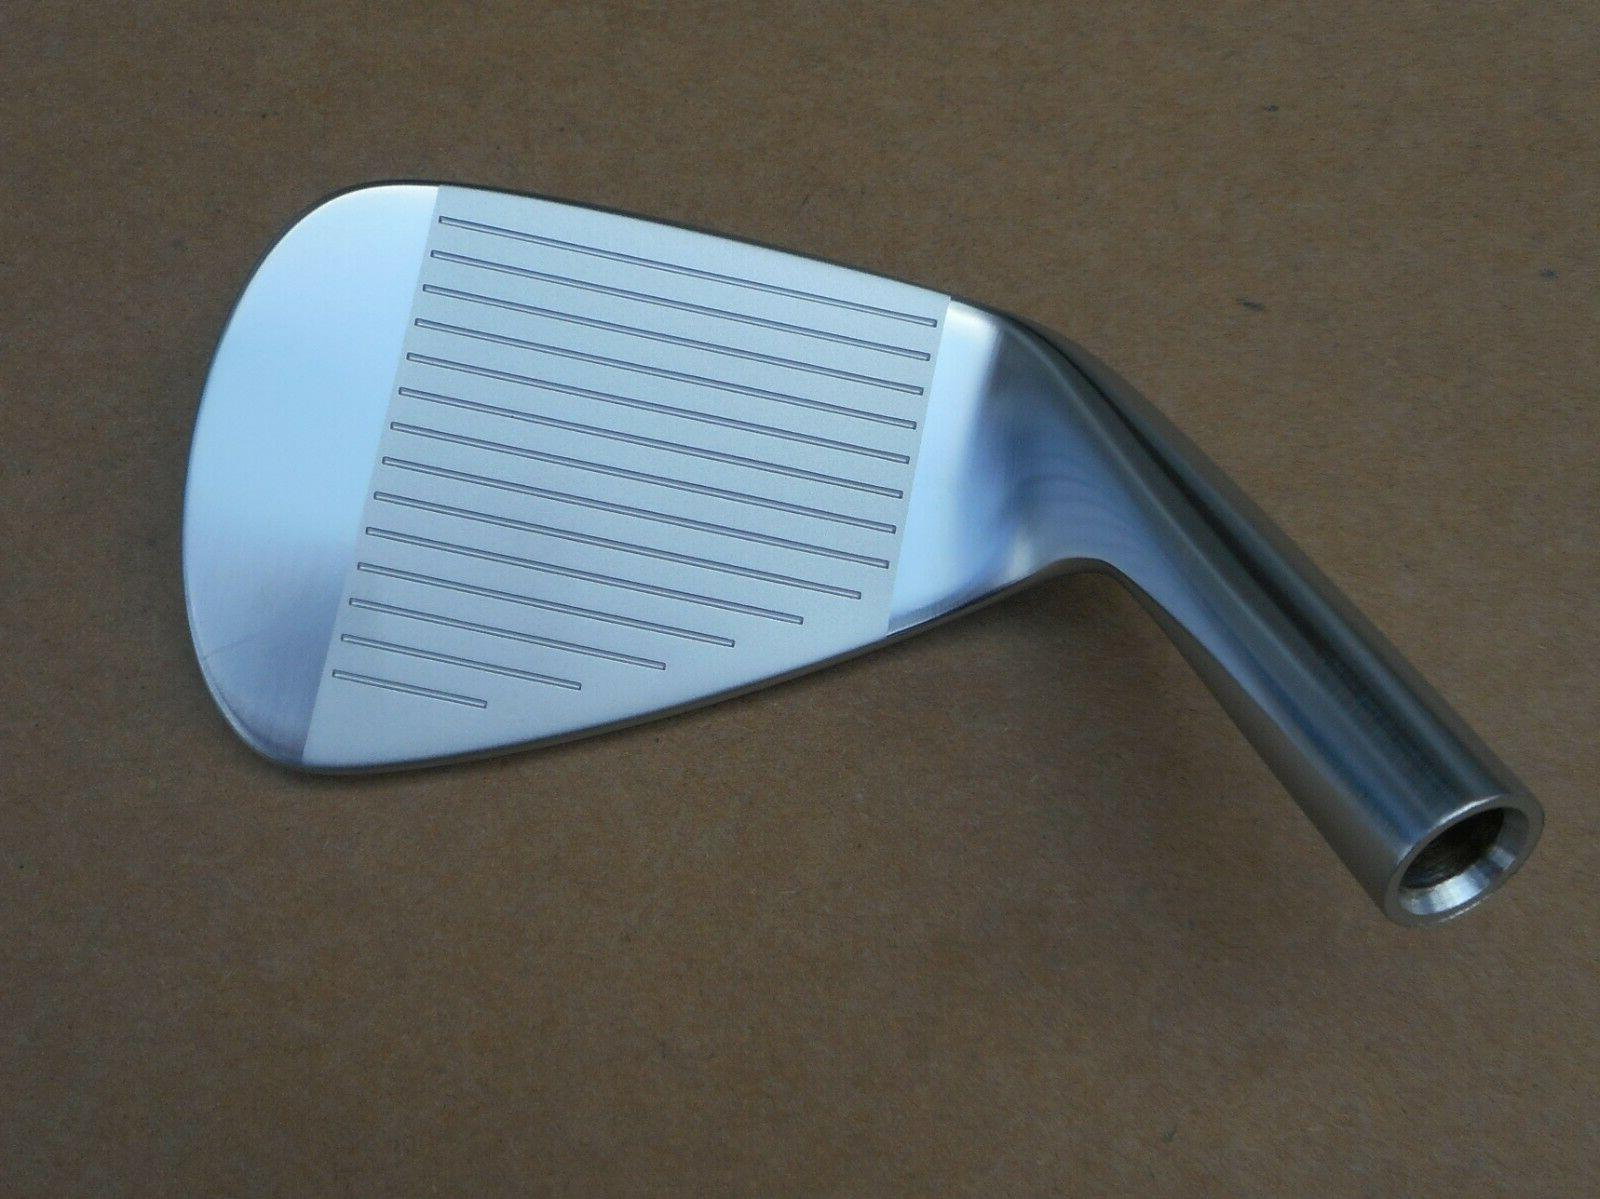 MB-001 3, 8 iron Wedge Tournament Blade